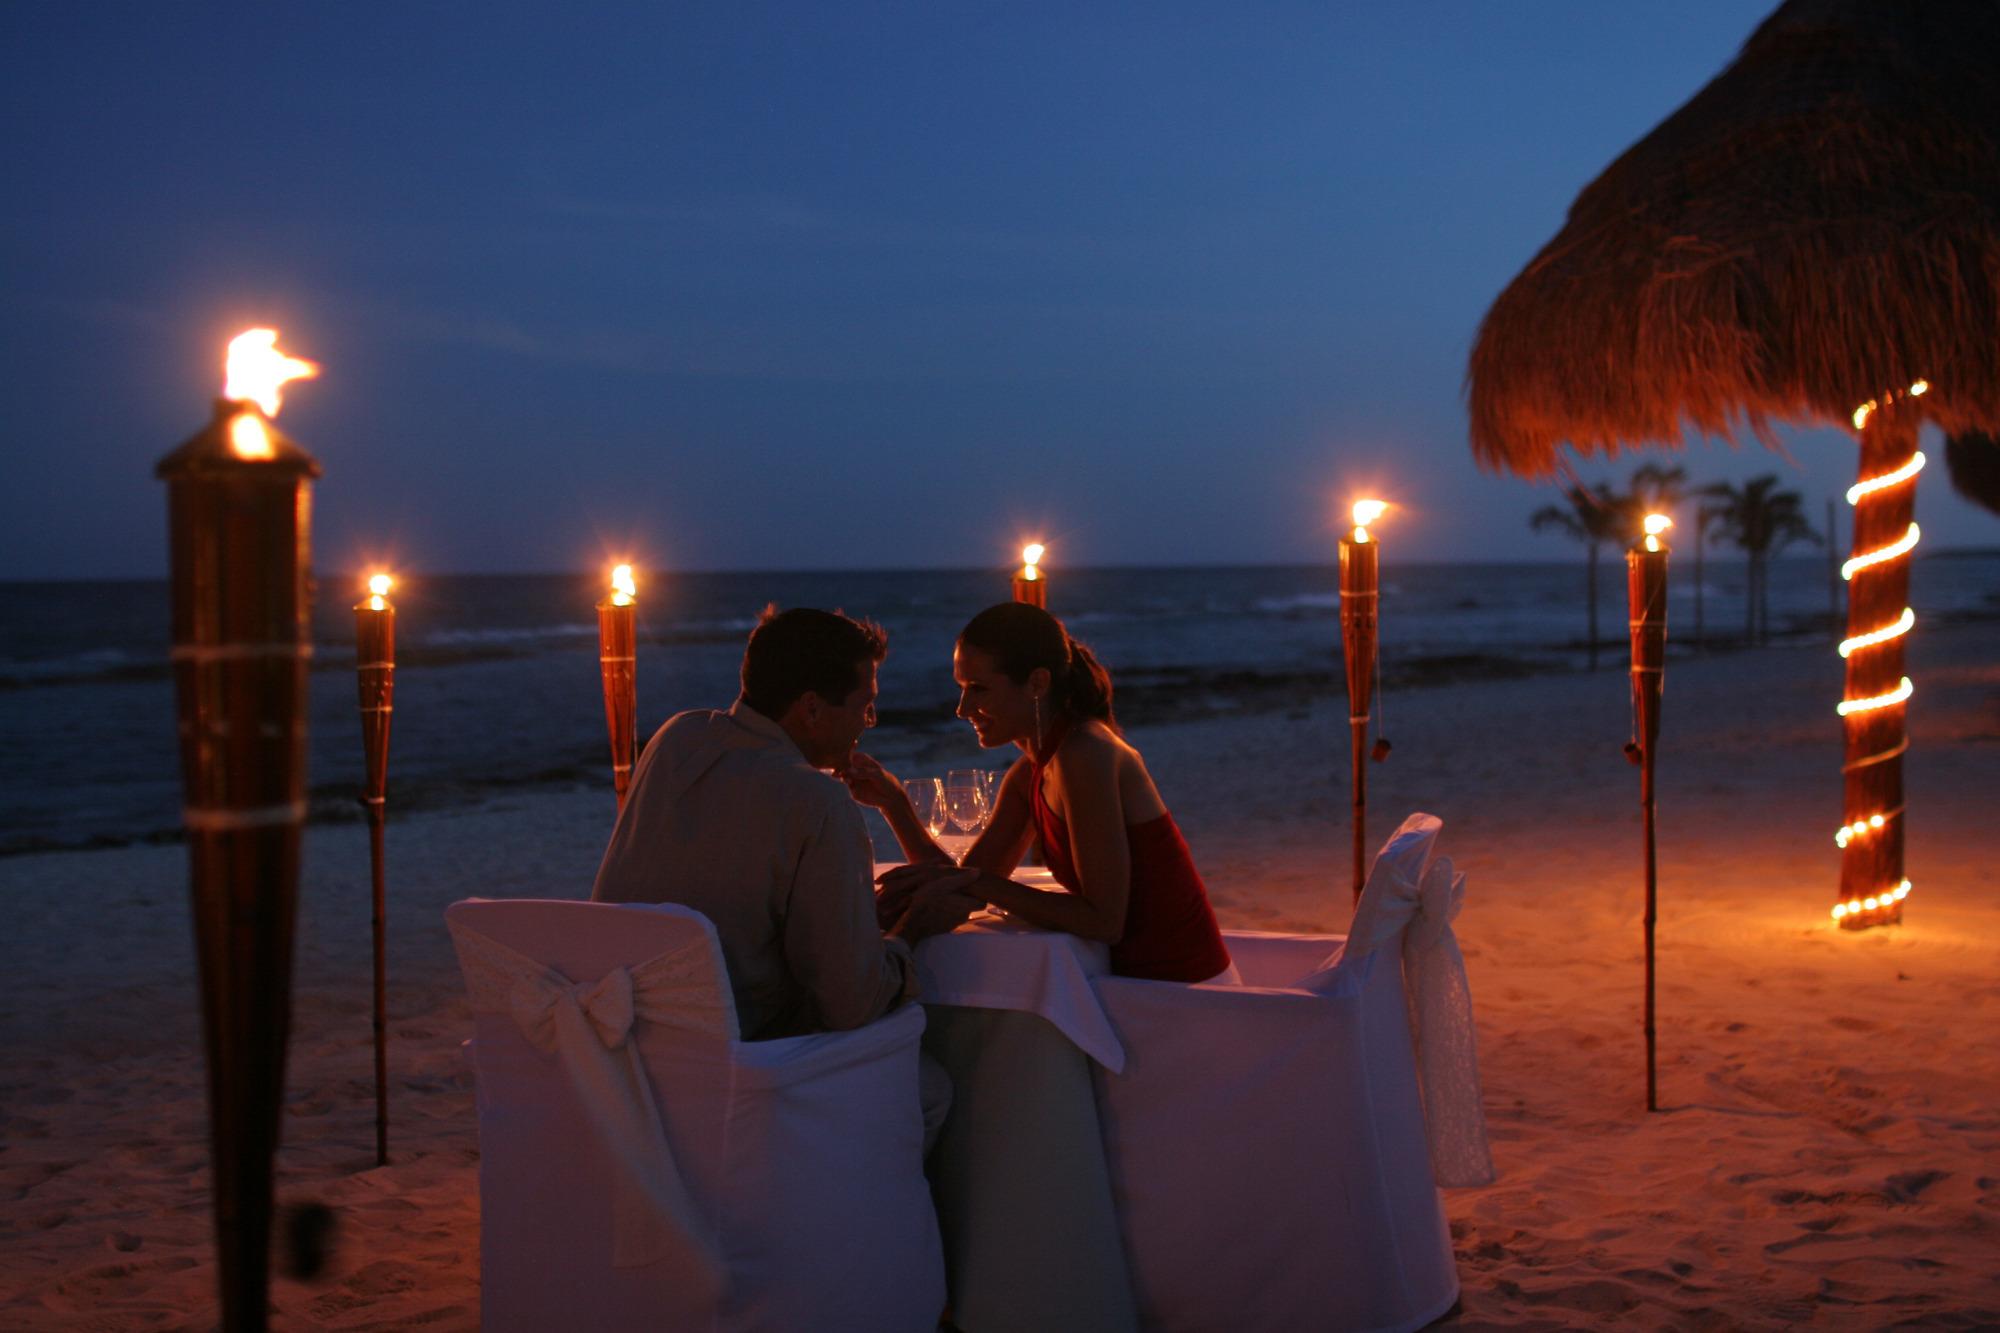 Romantic_night - Celebrate Valentines Day